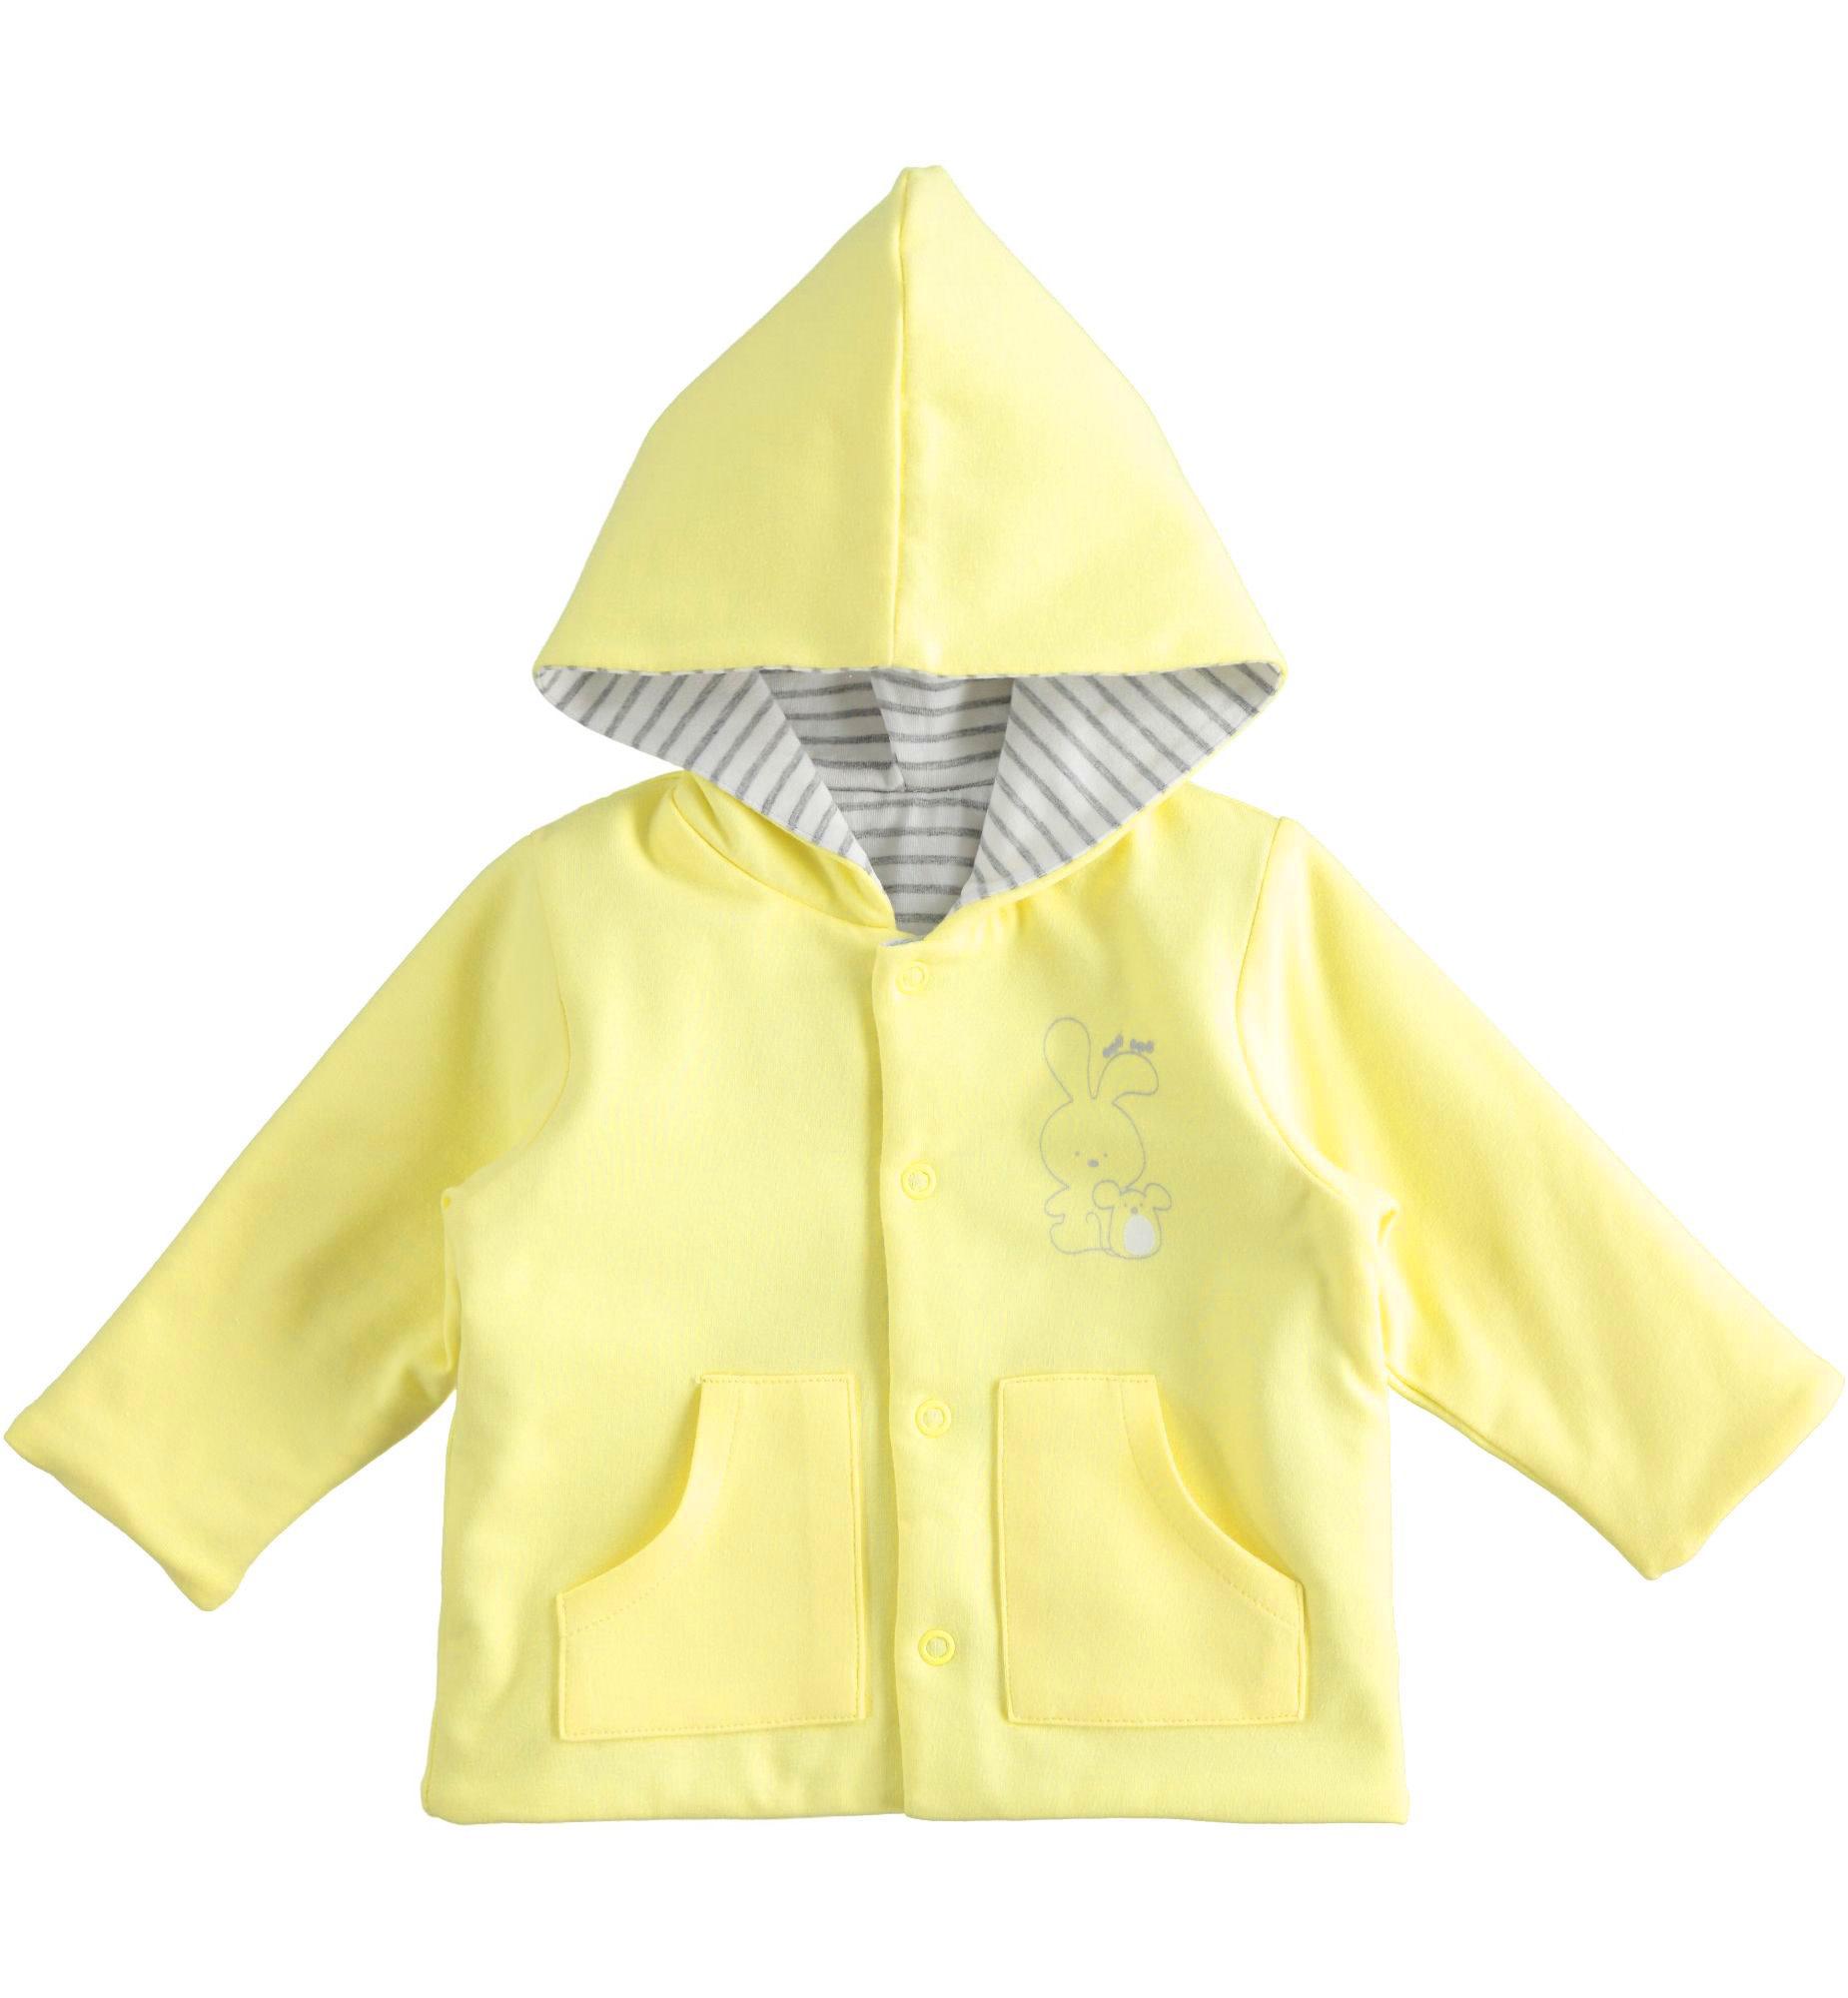 iDo IDo SS20 Boys Yellow and Grey Reversible Bunny Jacket J047